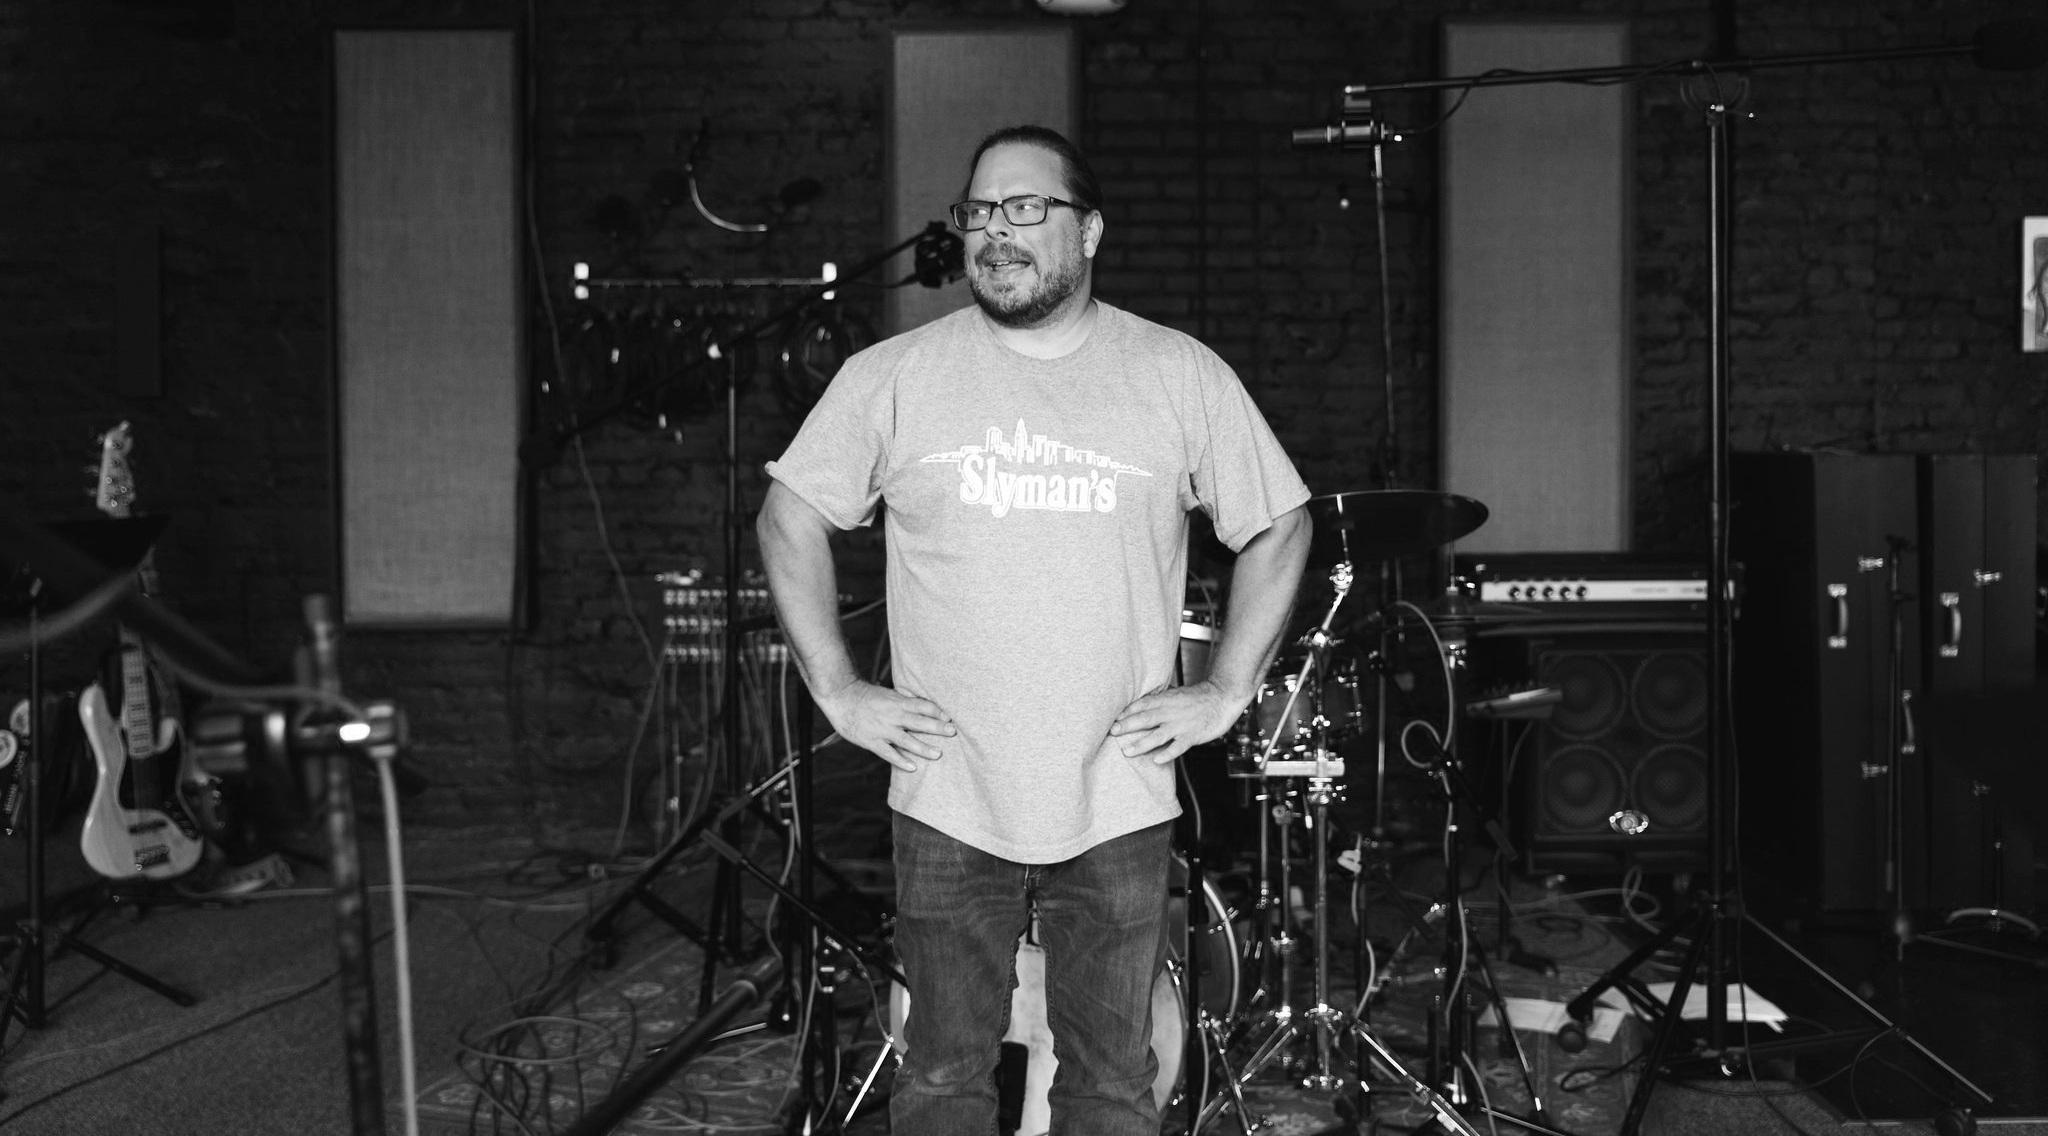 Jason /// Senior Content Director